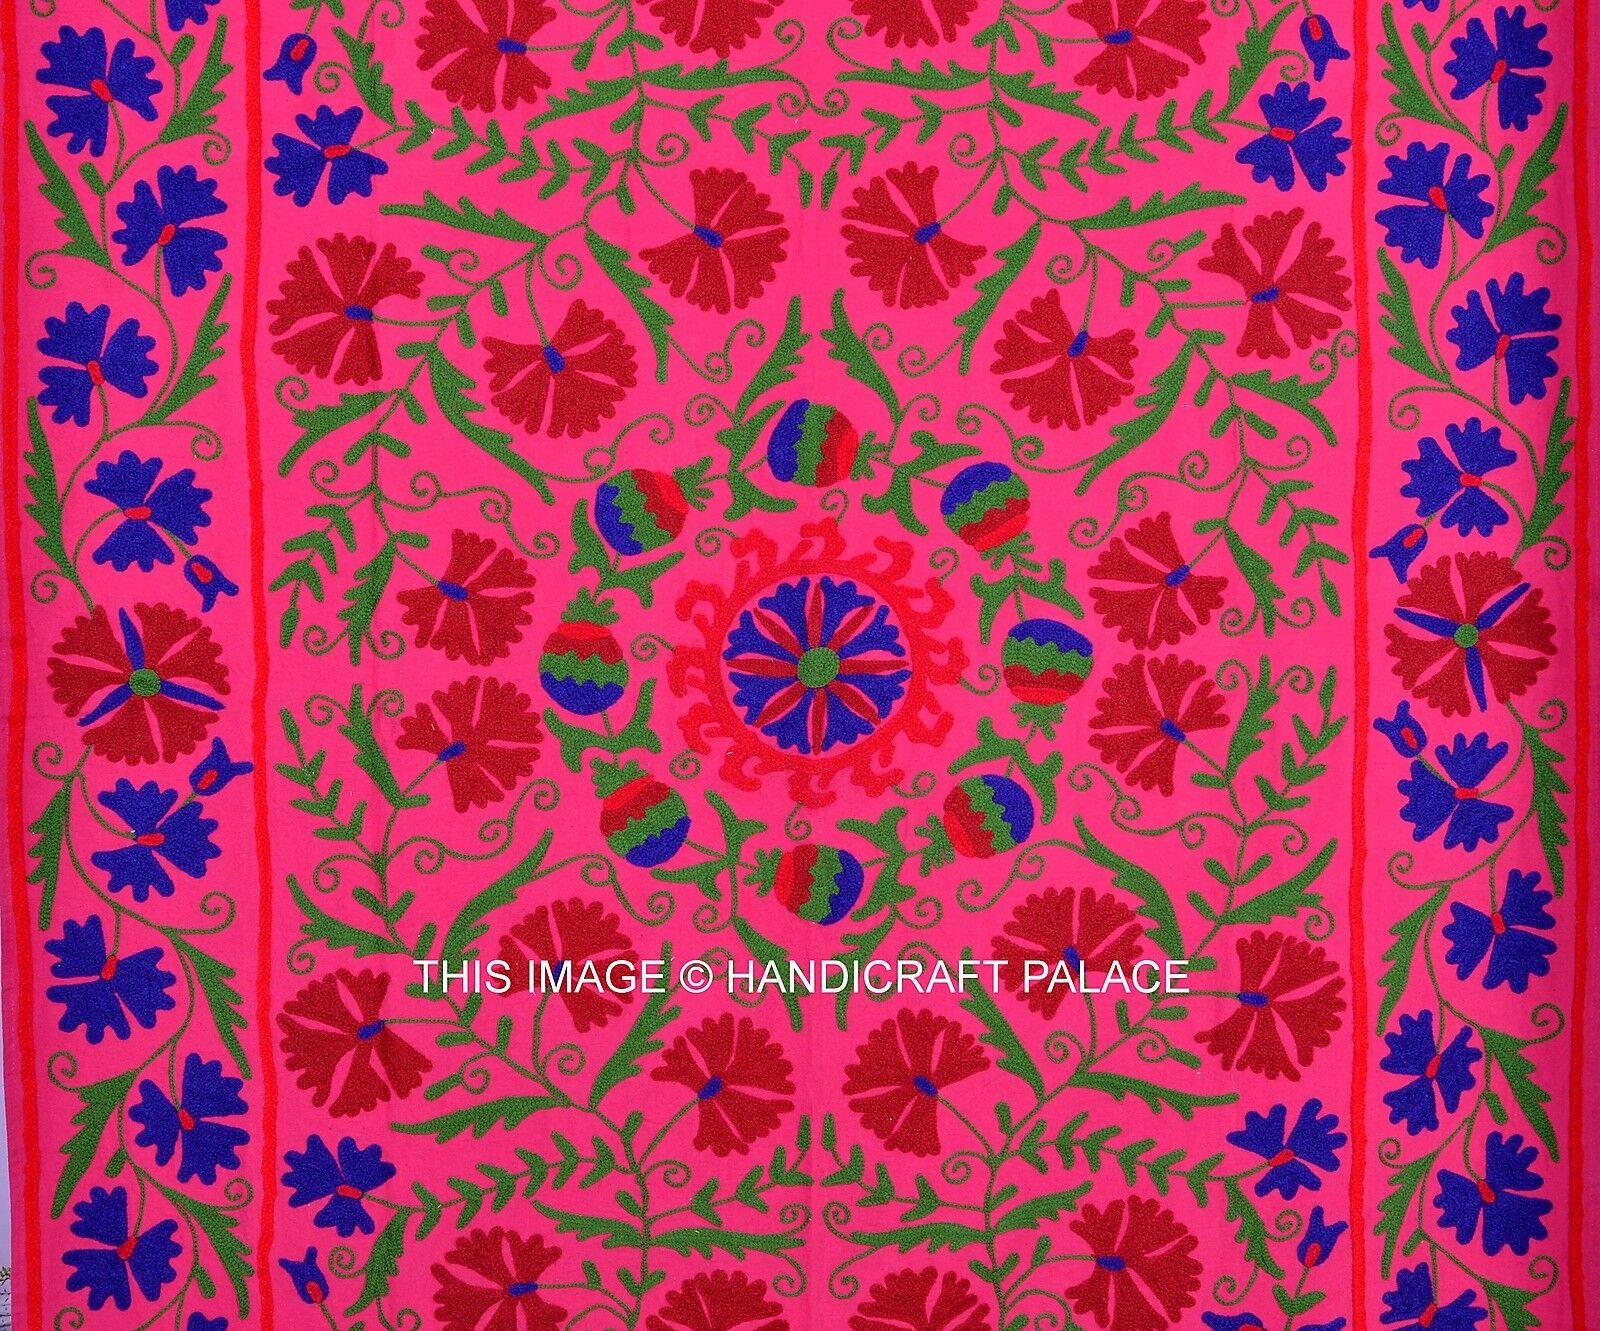 Floral Designer Uzbekistan Cotton Cotton Cotton uzani Boho Bedspread Embroiderot Wall Hanging 511b0d